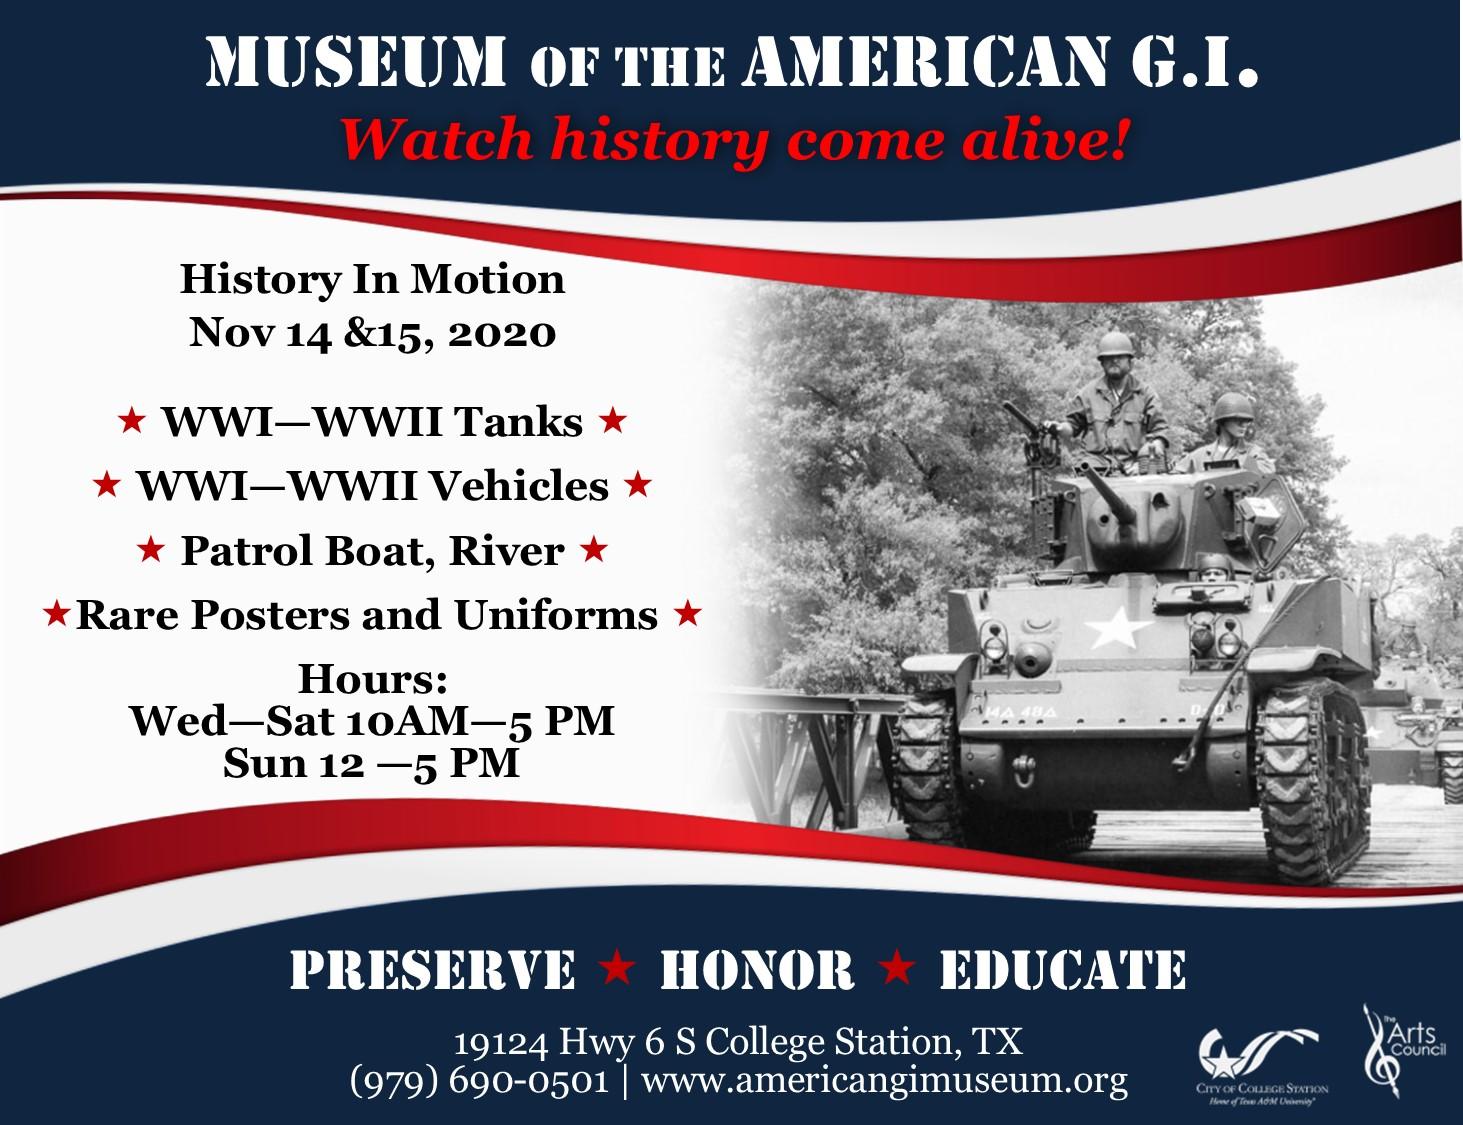 American G.I. Museum